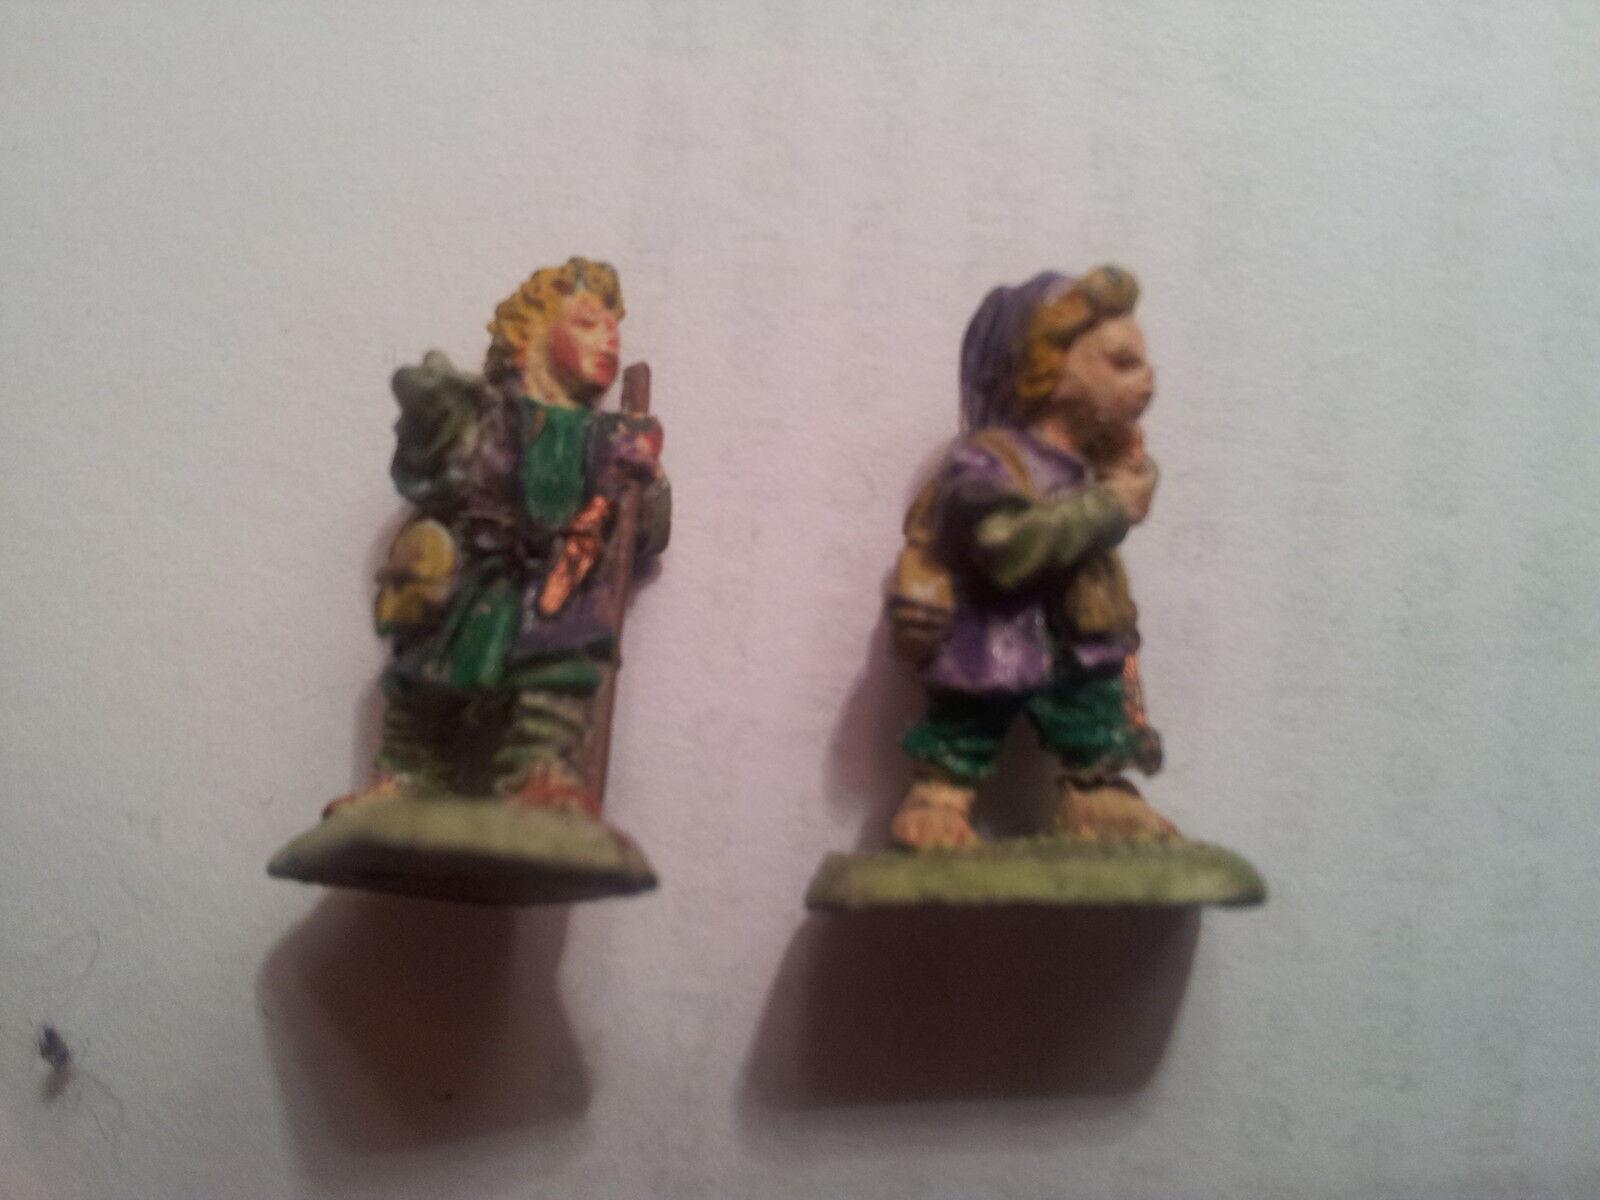 Mithril Miniatures M57 Hobbit Travellers 1988 OOP